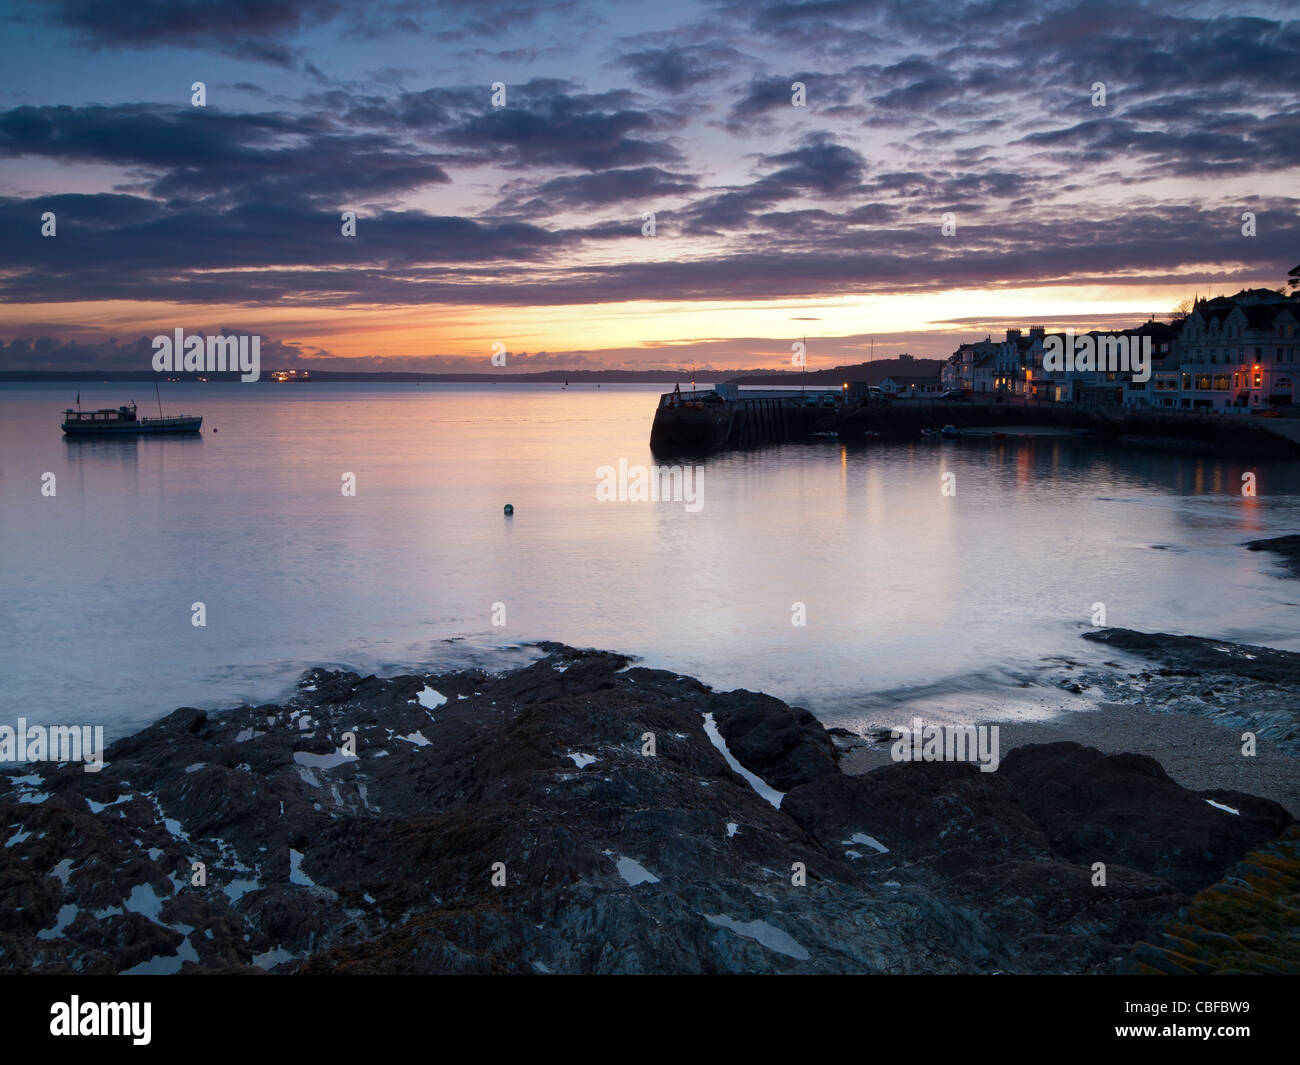 Abenddämmerung an der St Mawes Cornwall England UK Stockbild